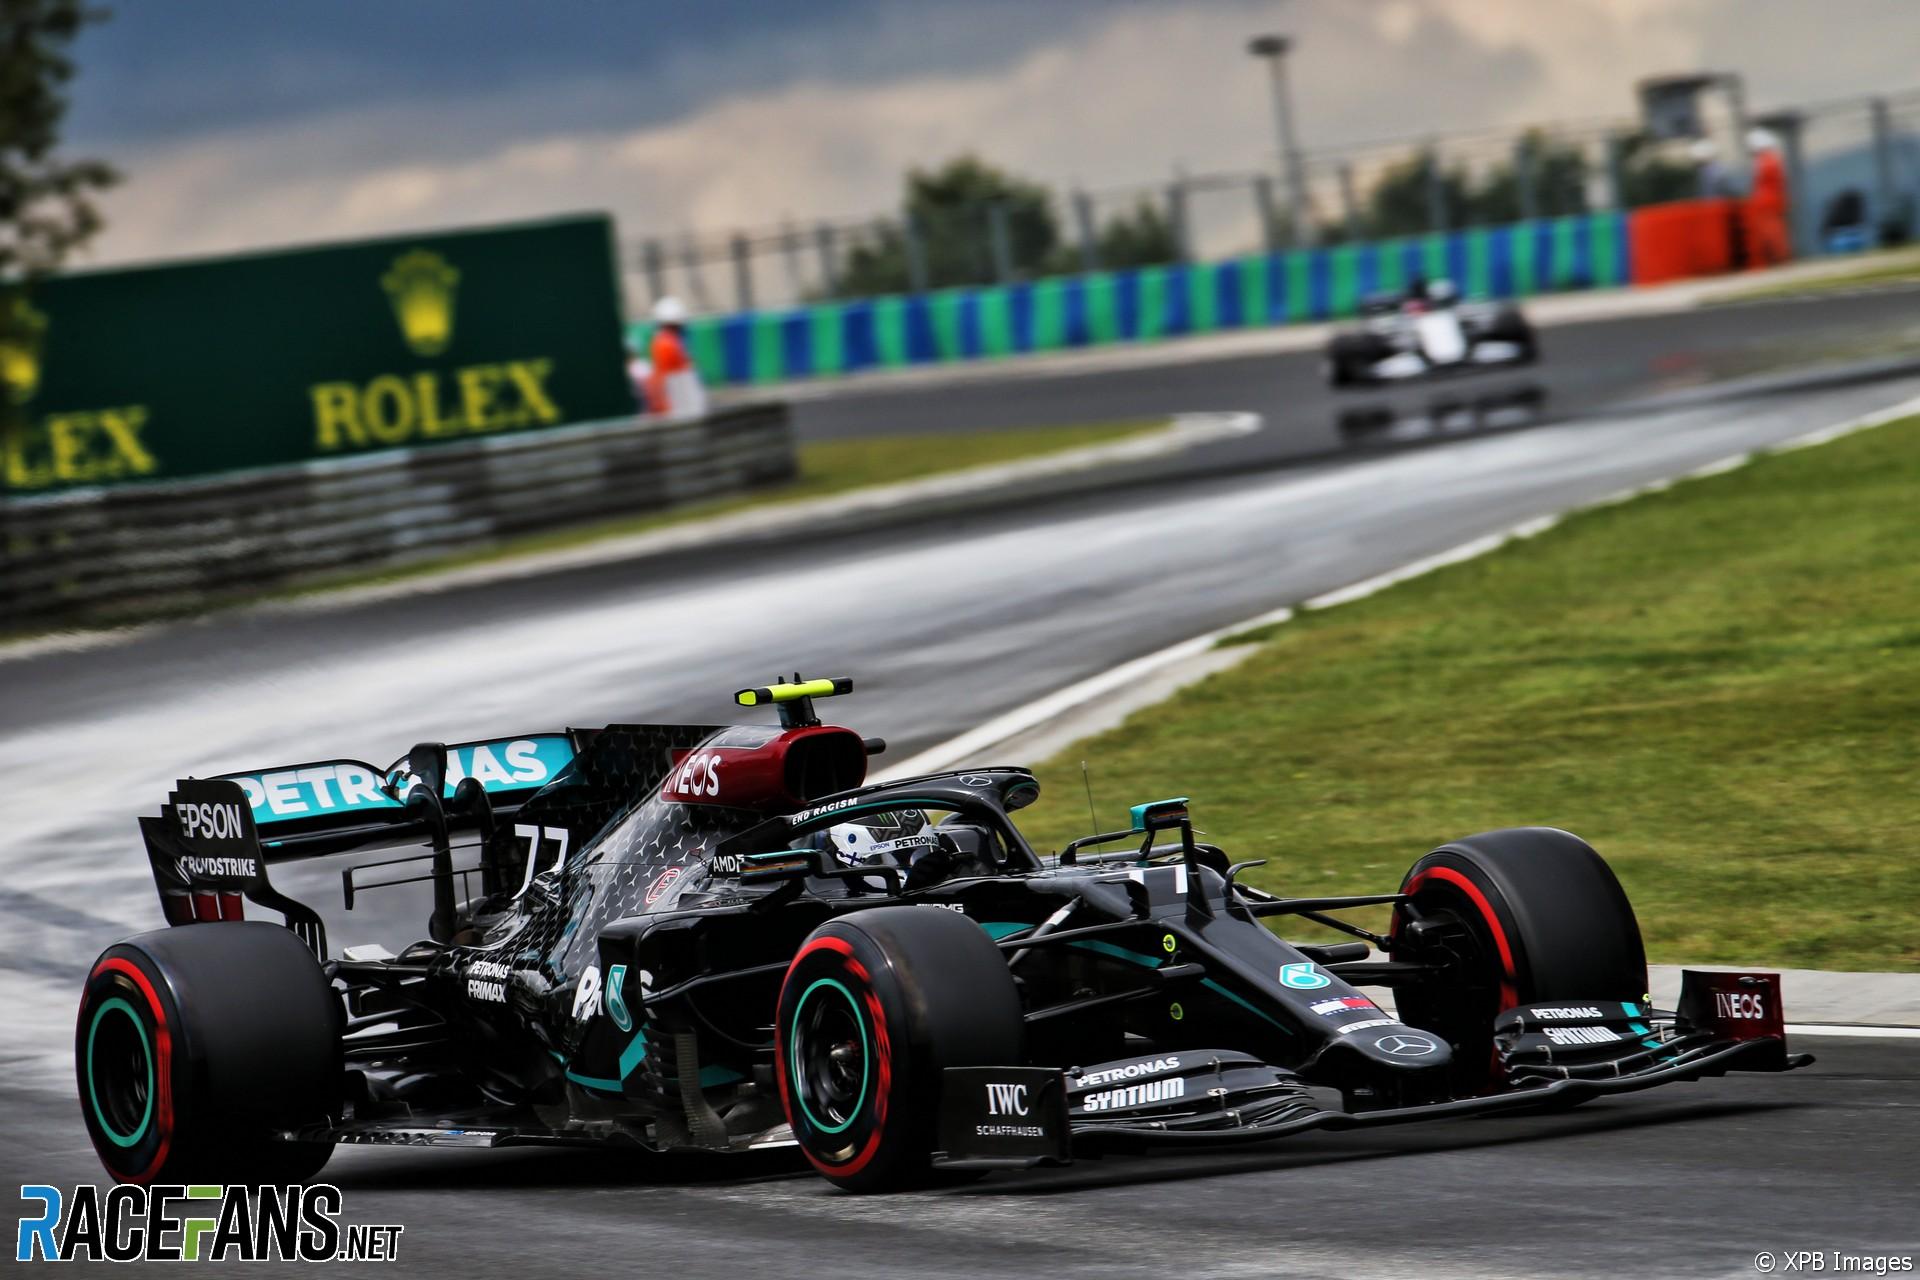 Valtteri Bottas, Mercedes, Hungaroring, 2020